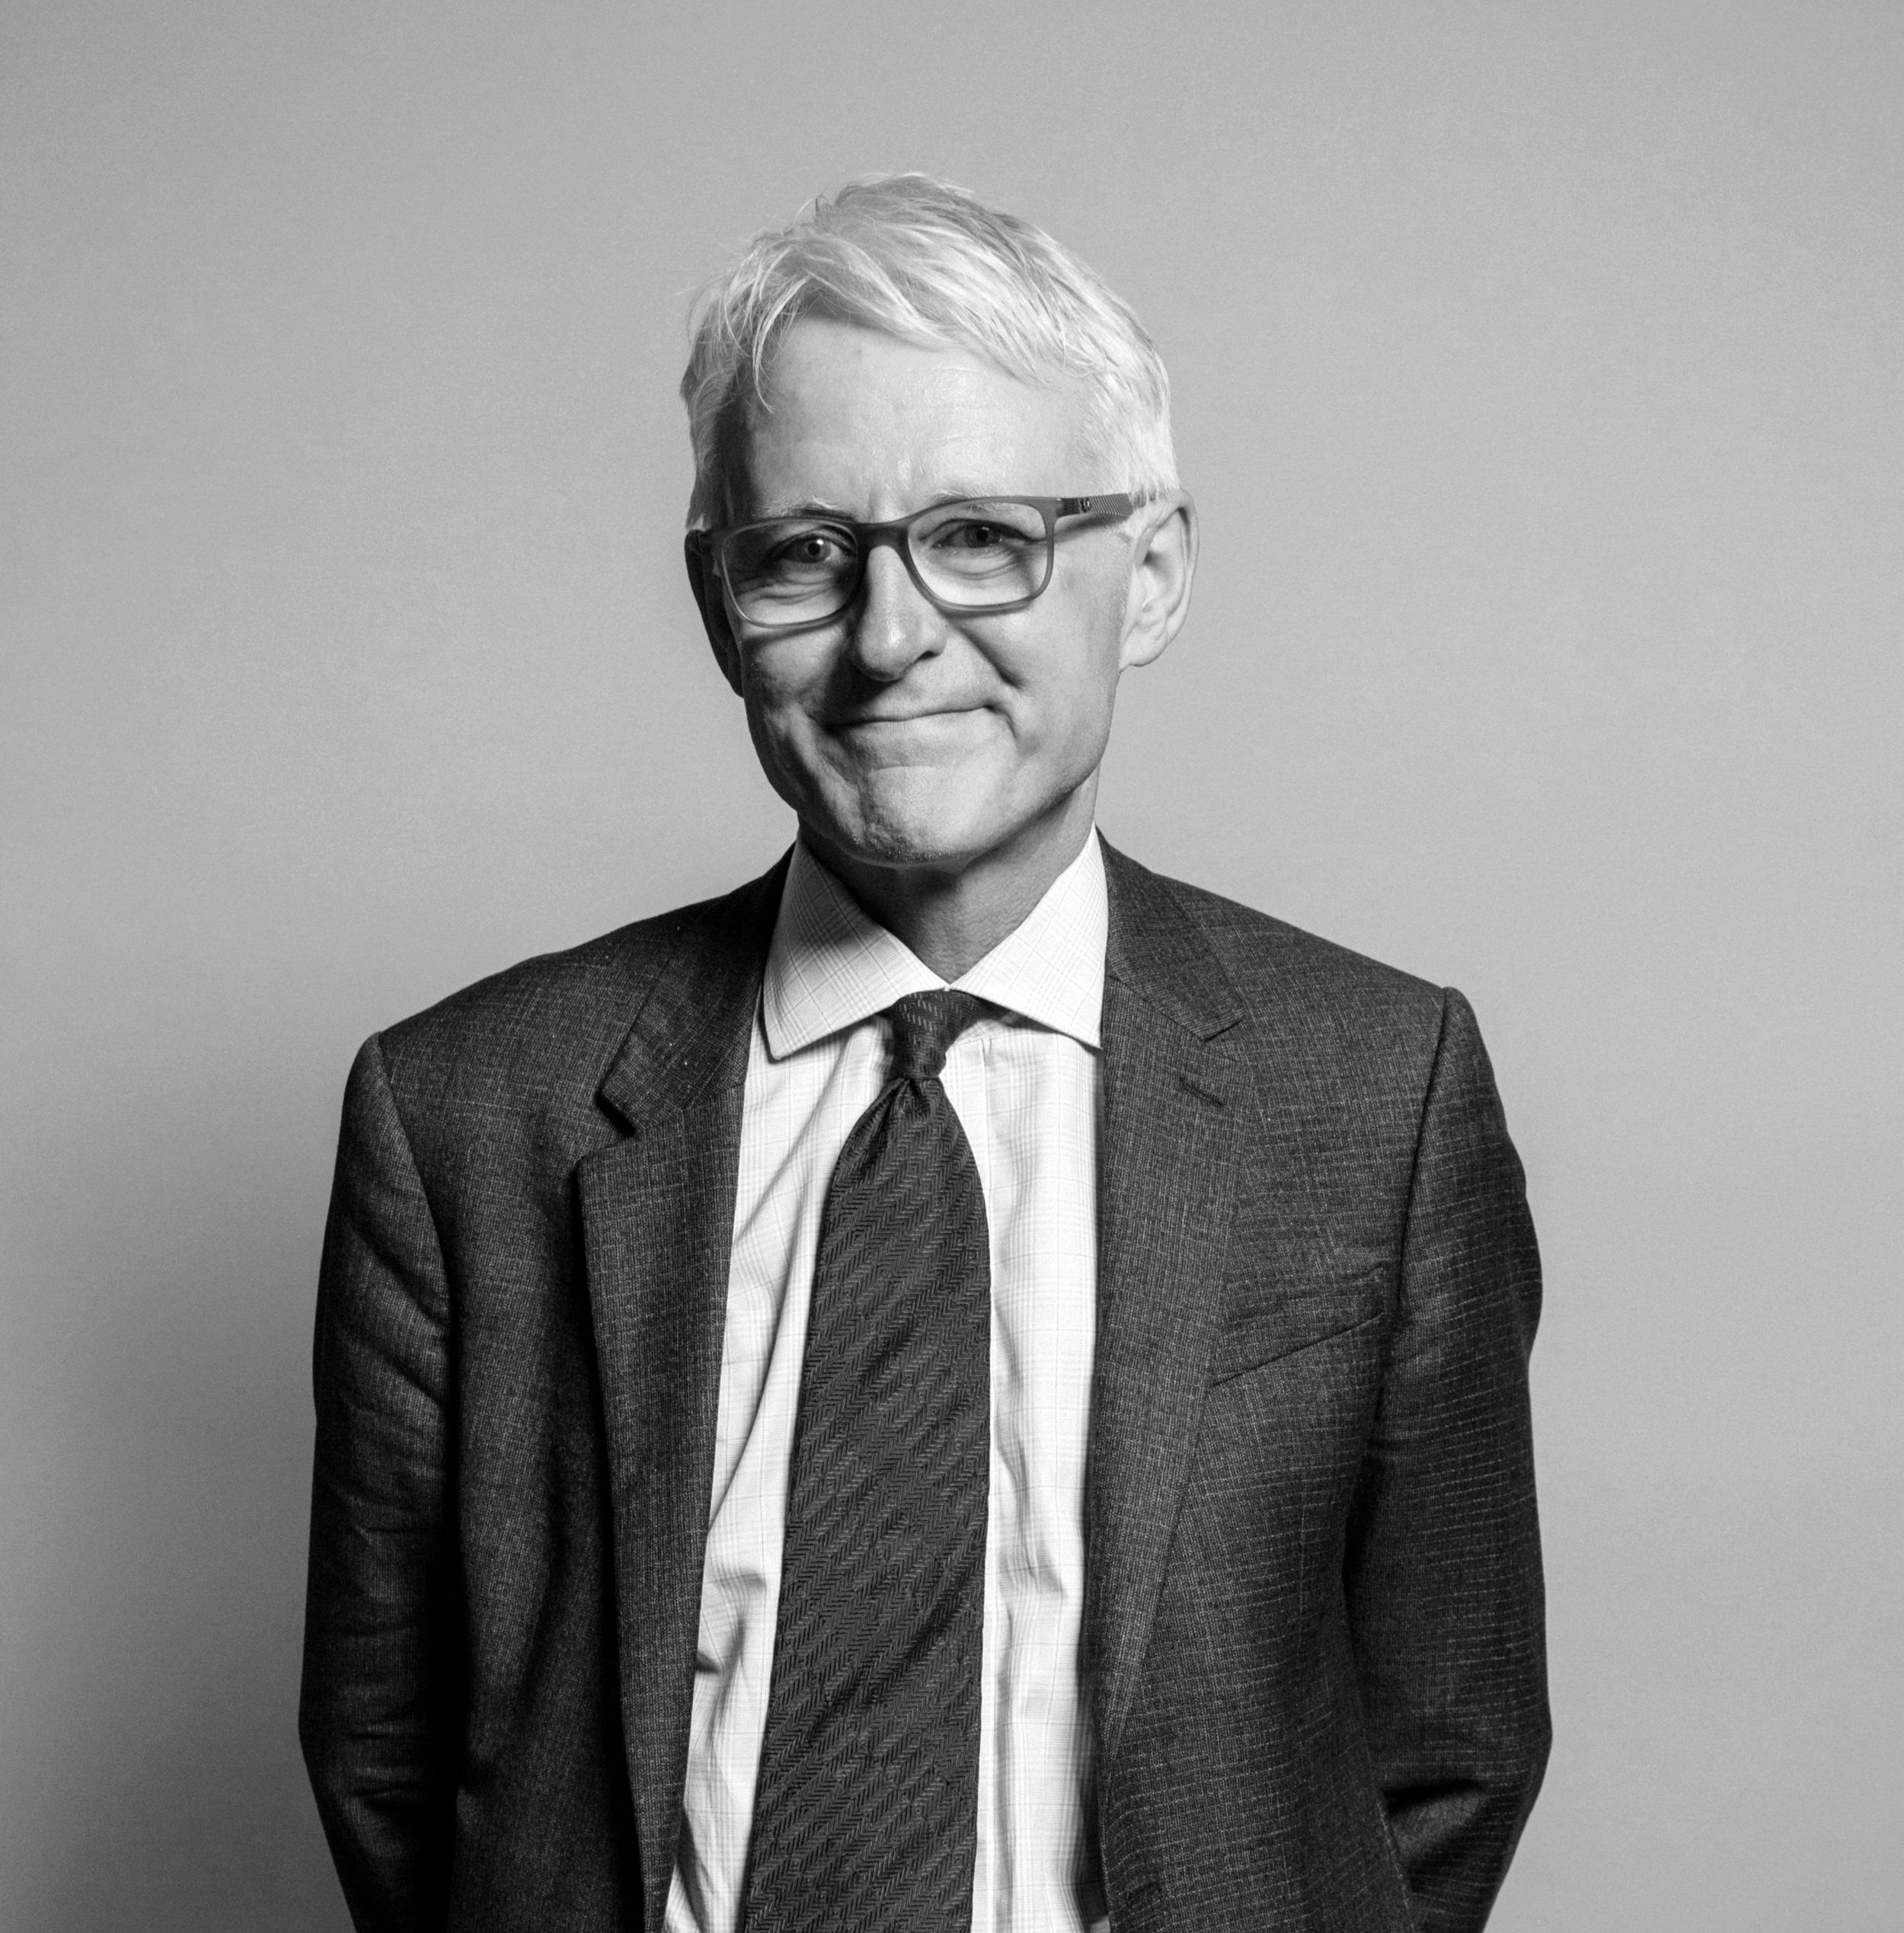 Norman Lamb MP, Parliament of the United Kingdom